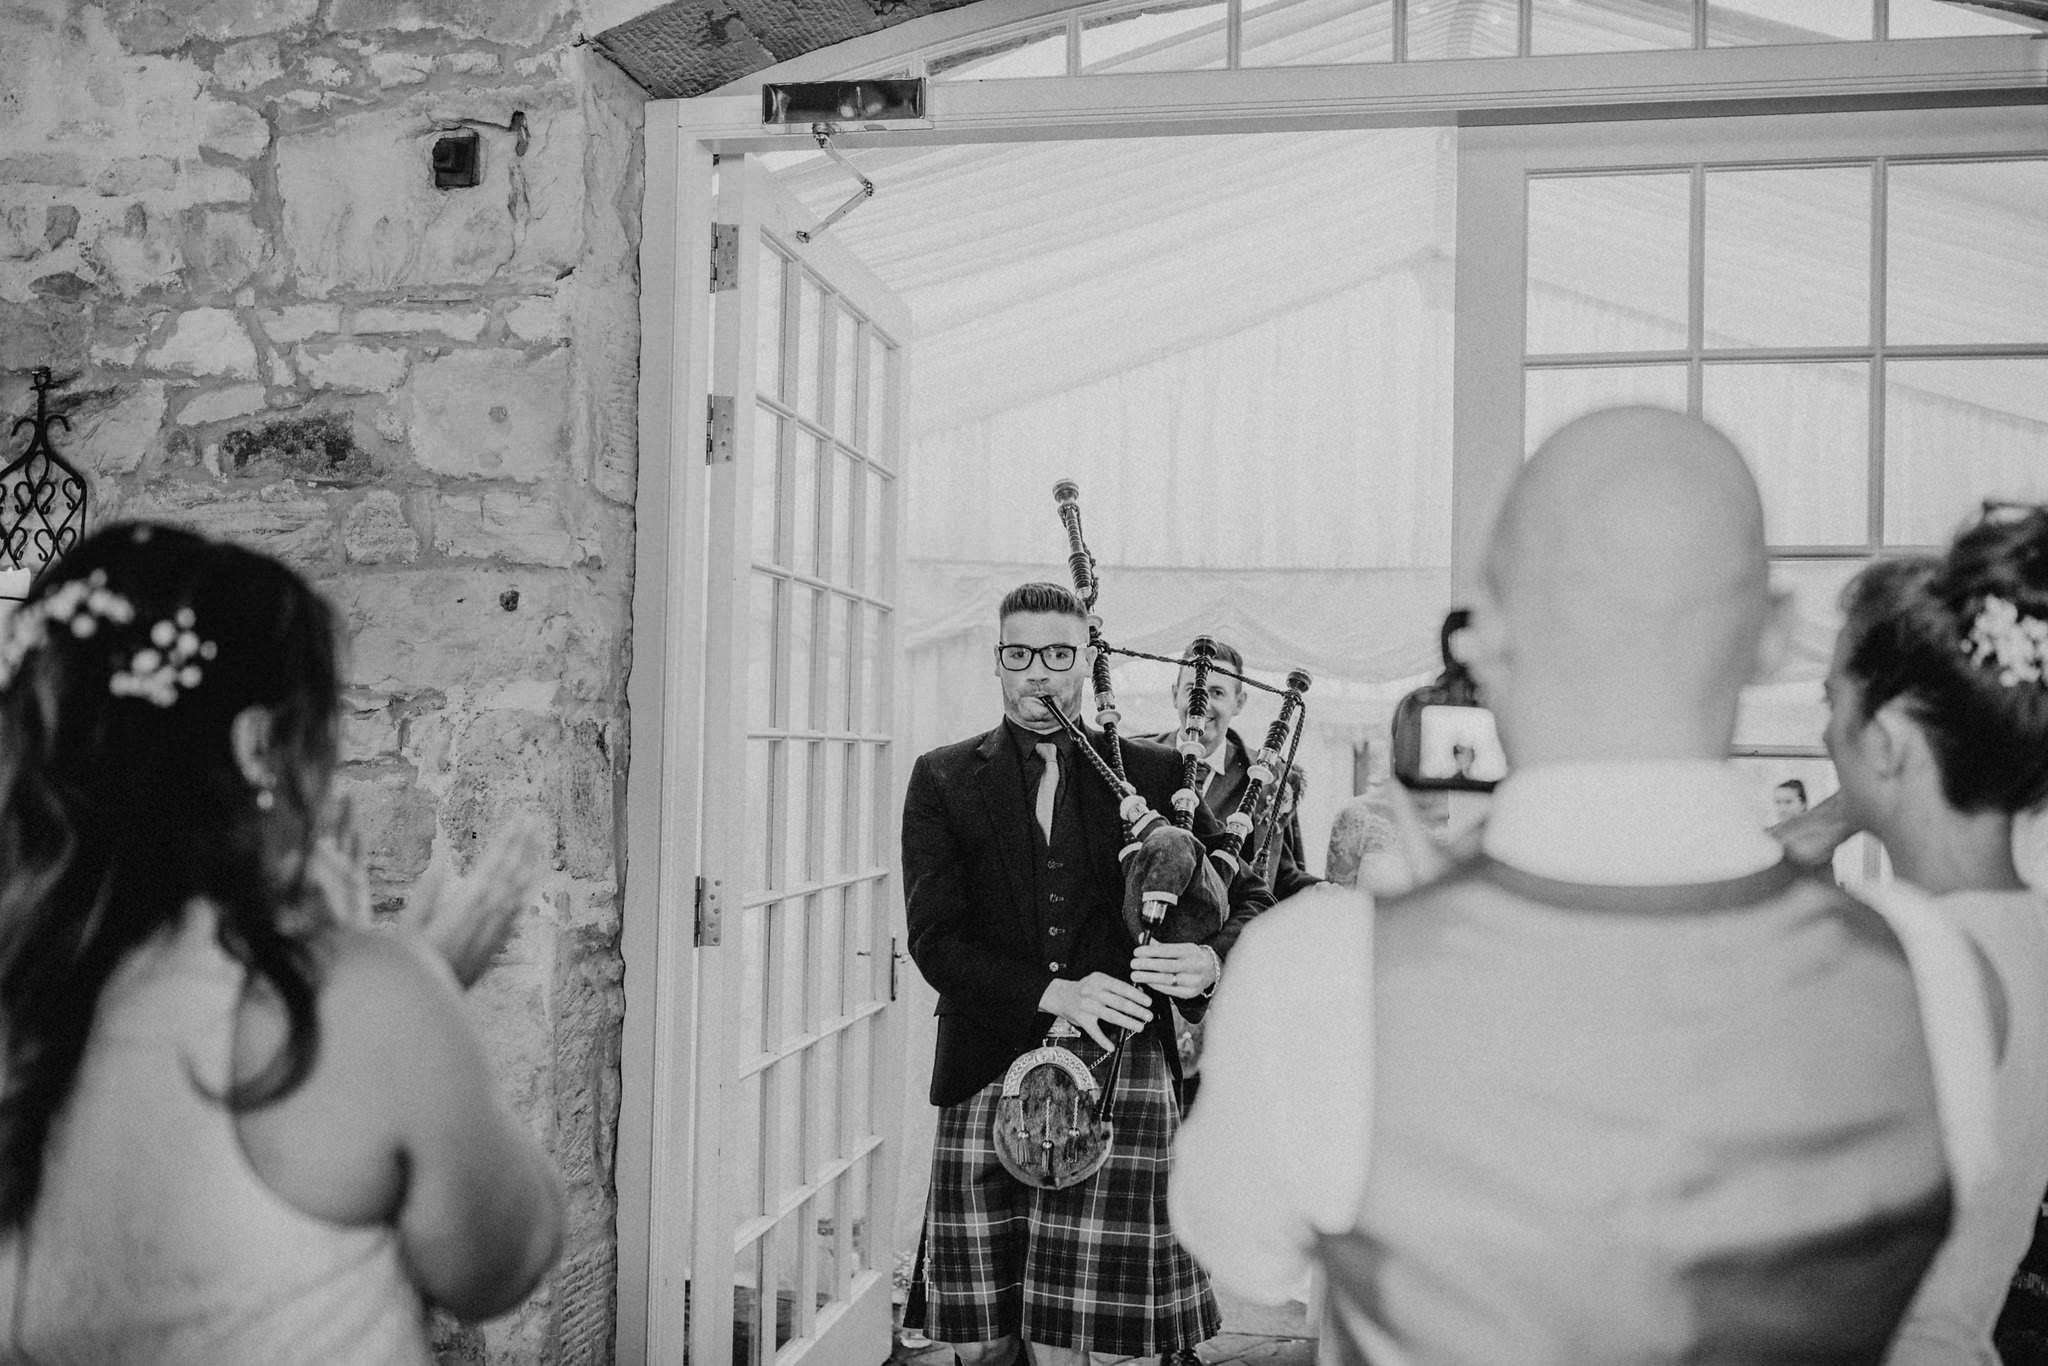 kirknewton stables wedding photographer (56).jpg